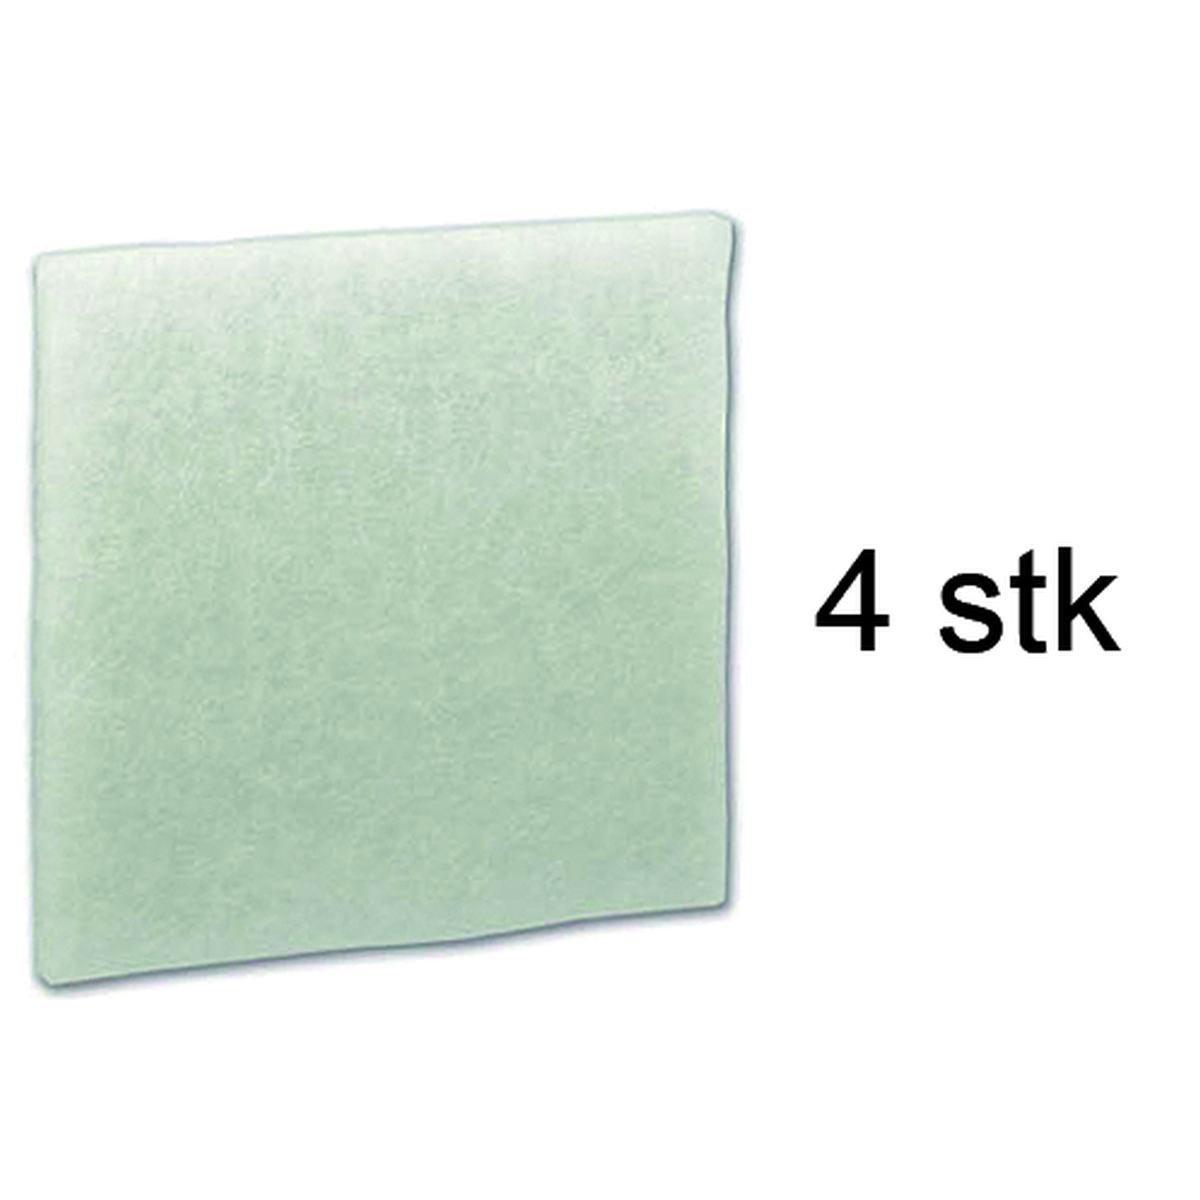 Forfiltersett G3 4 stk.